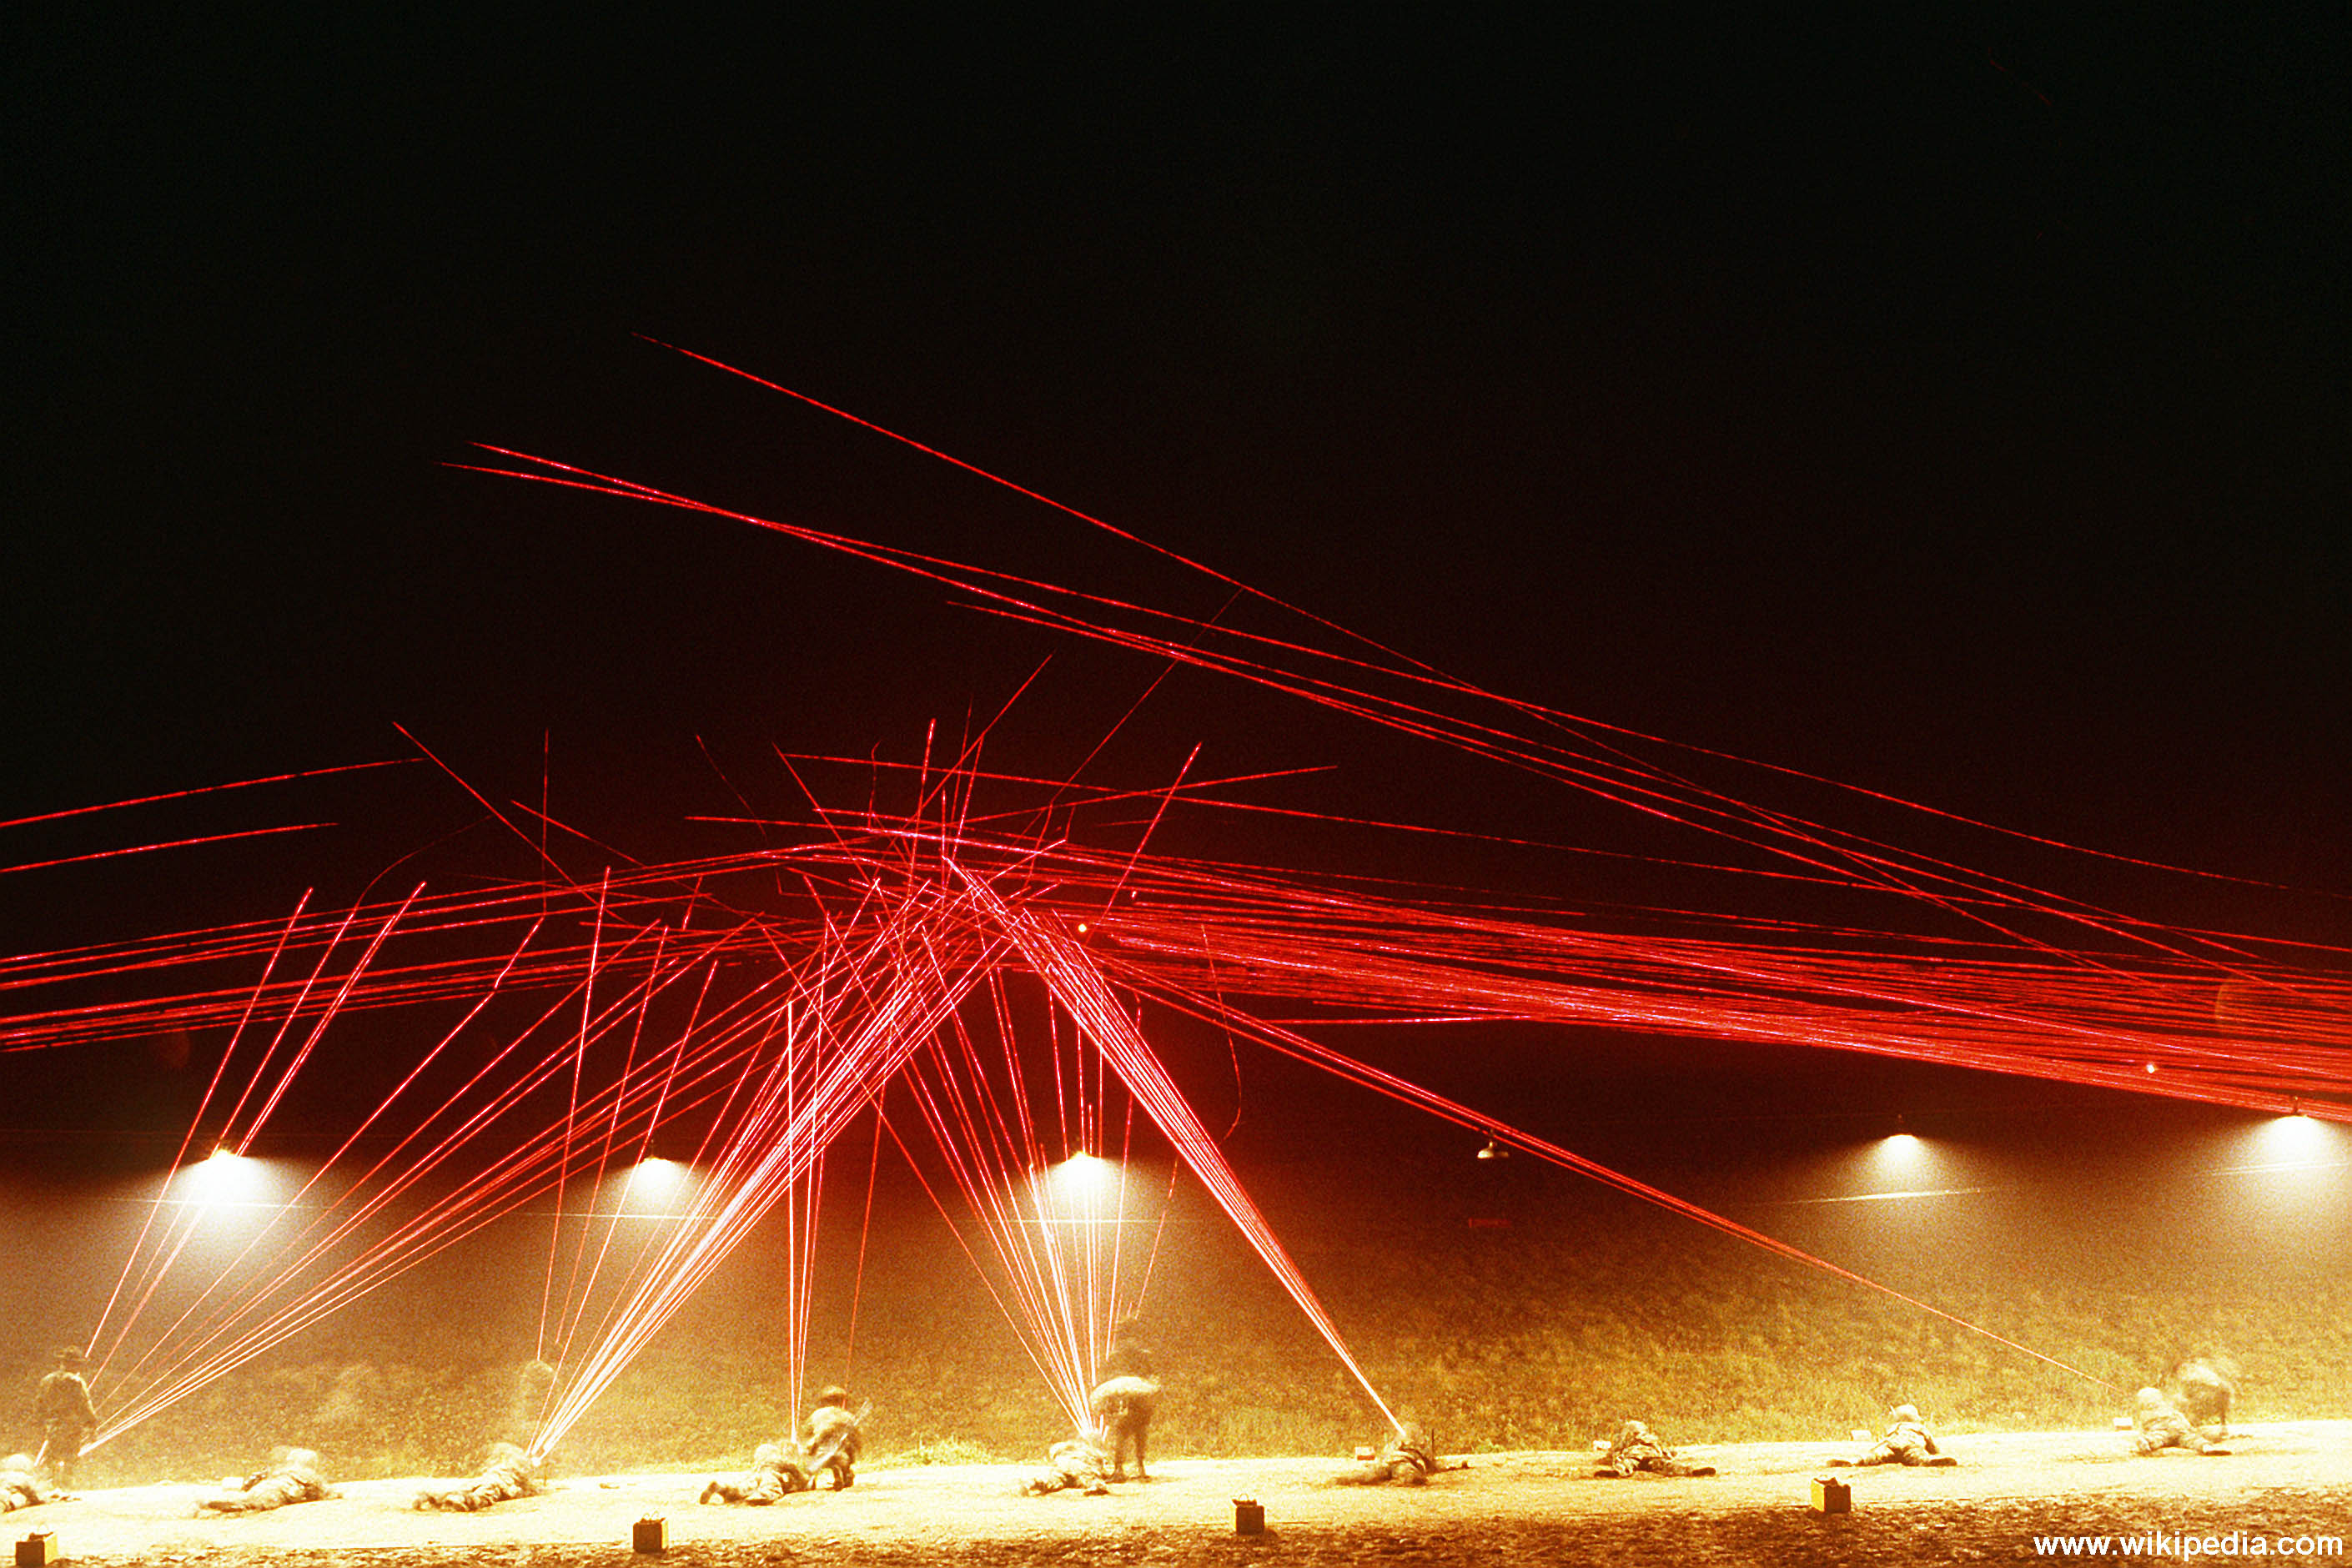 projectiles tracants police scientifique